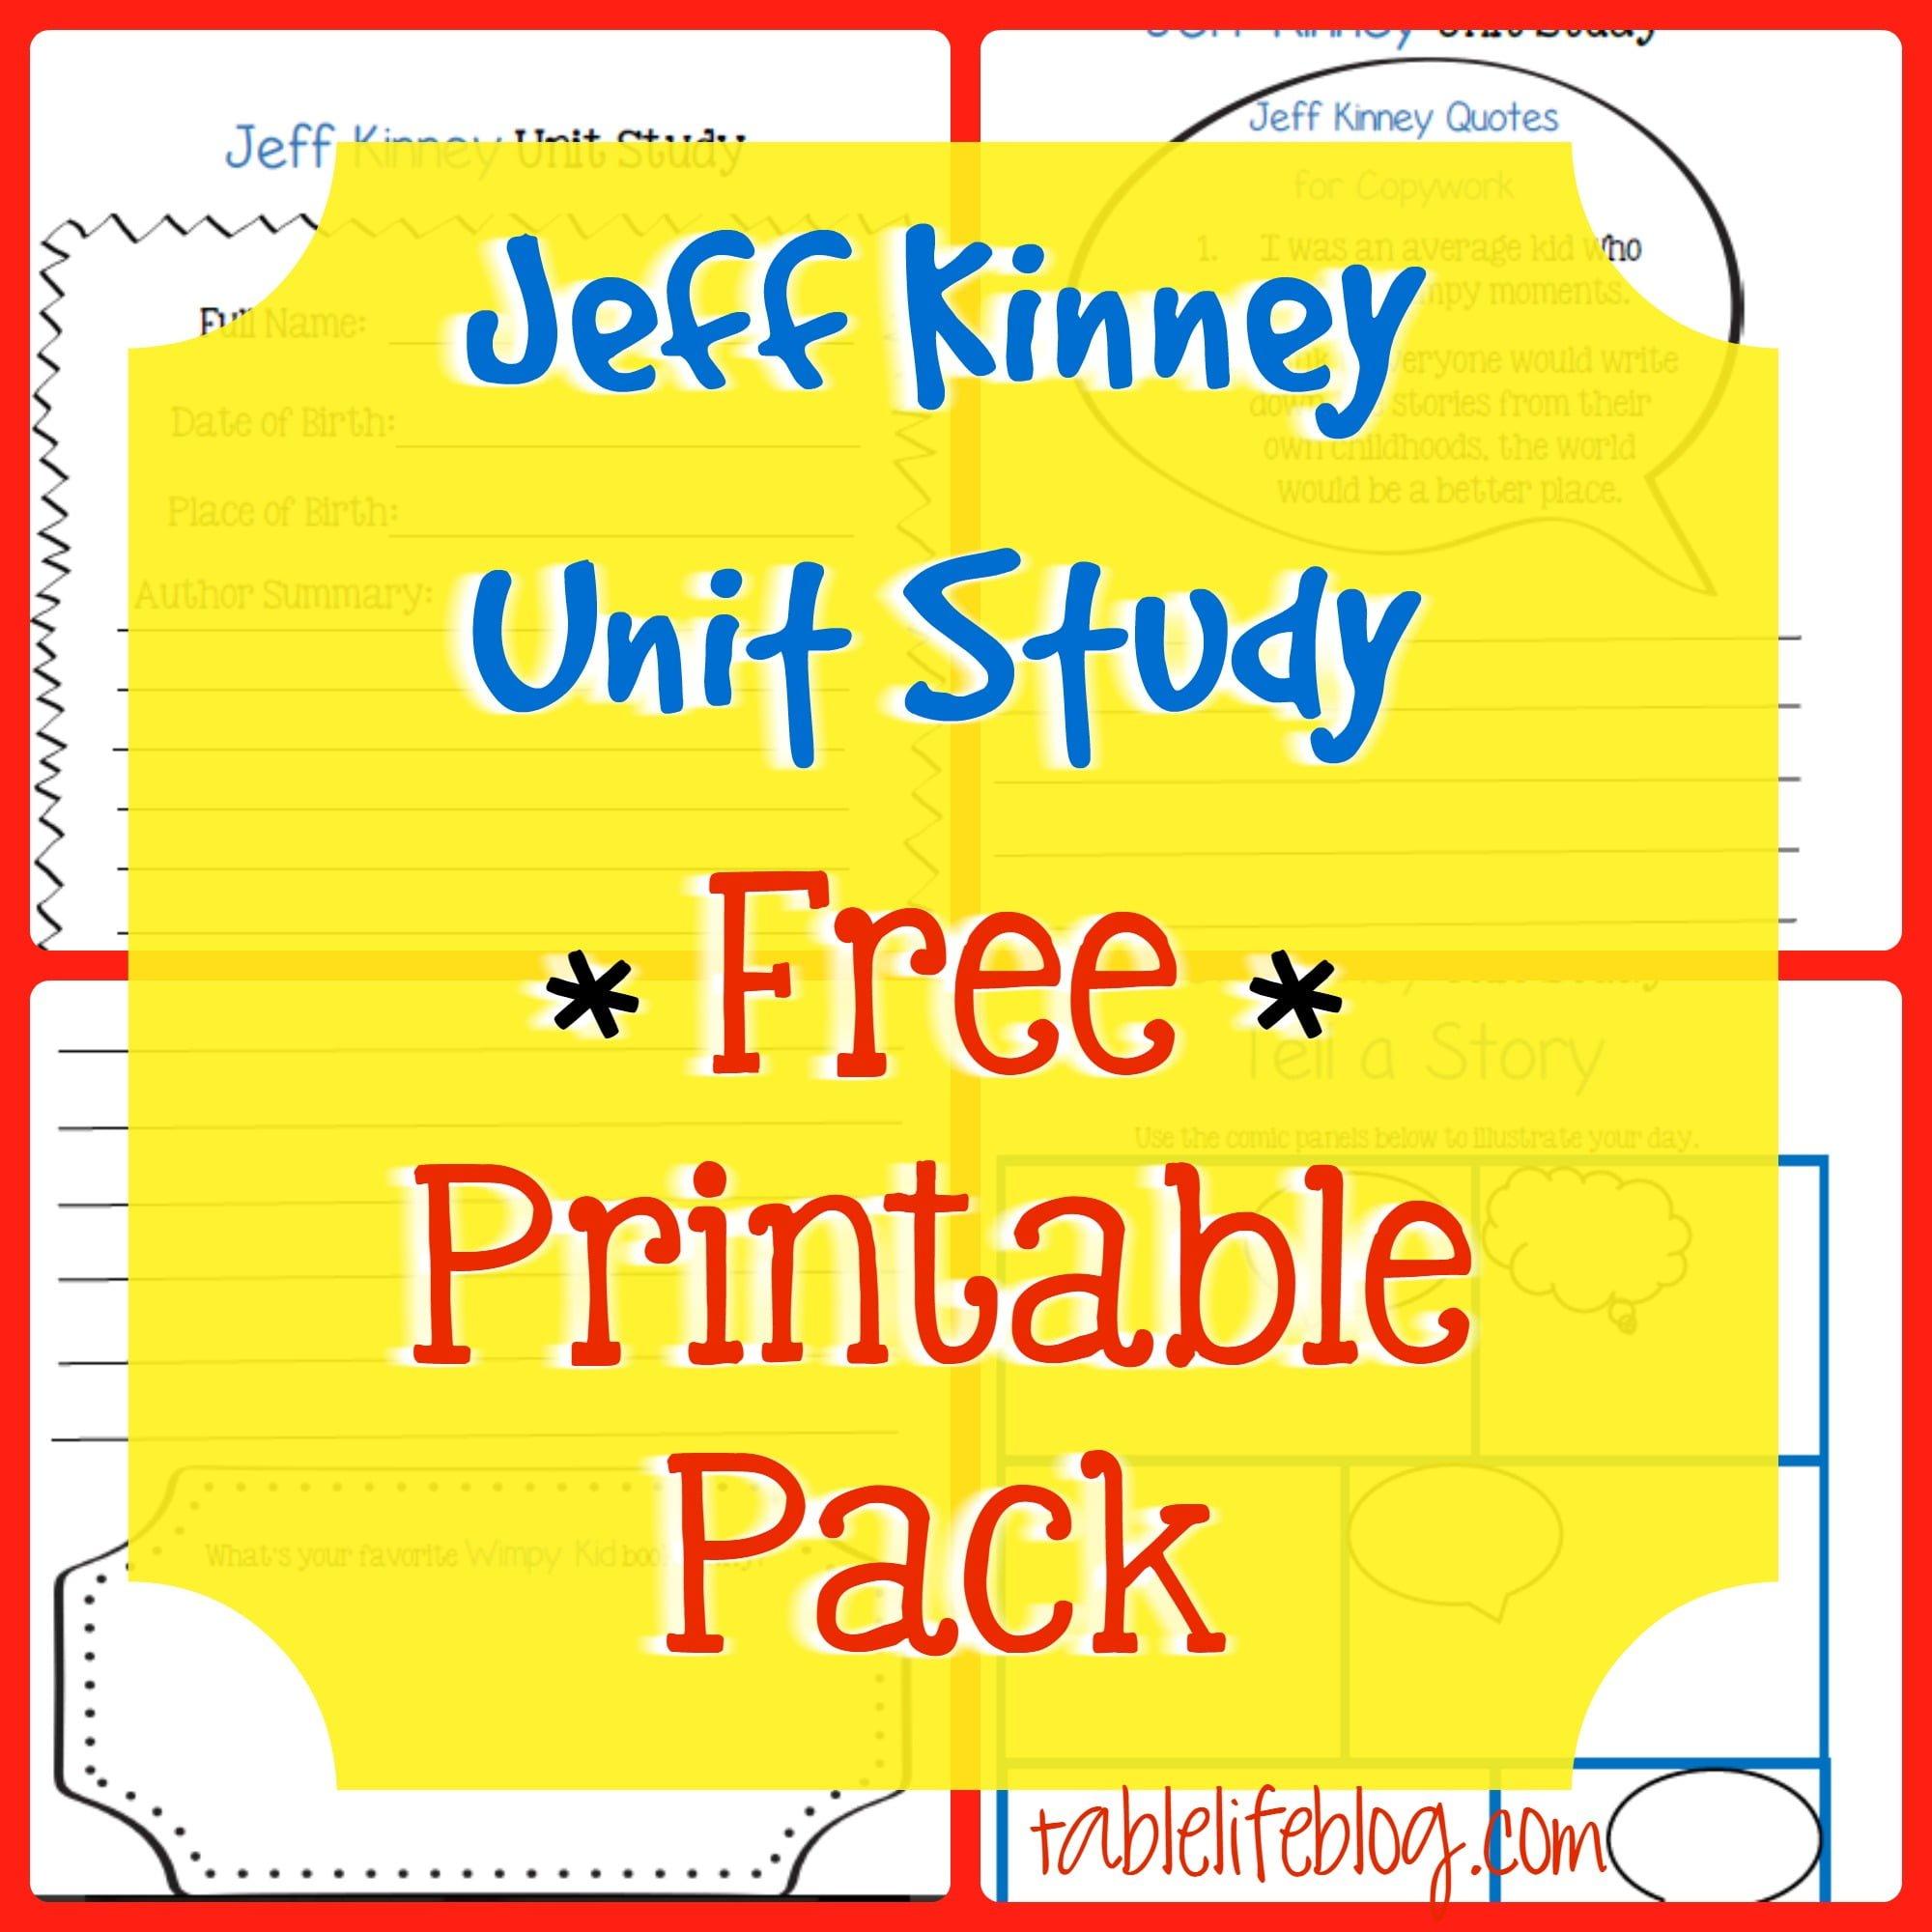 Jeff kinney unit study tablelifeblog solutioingenieria Choice Image